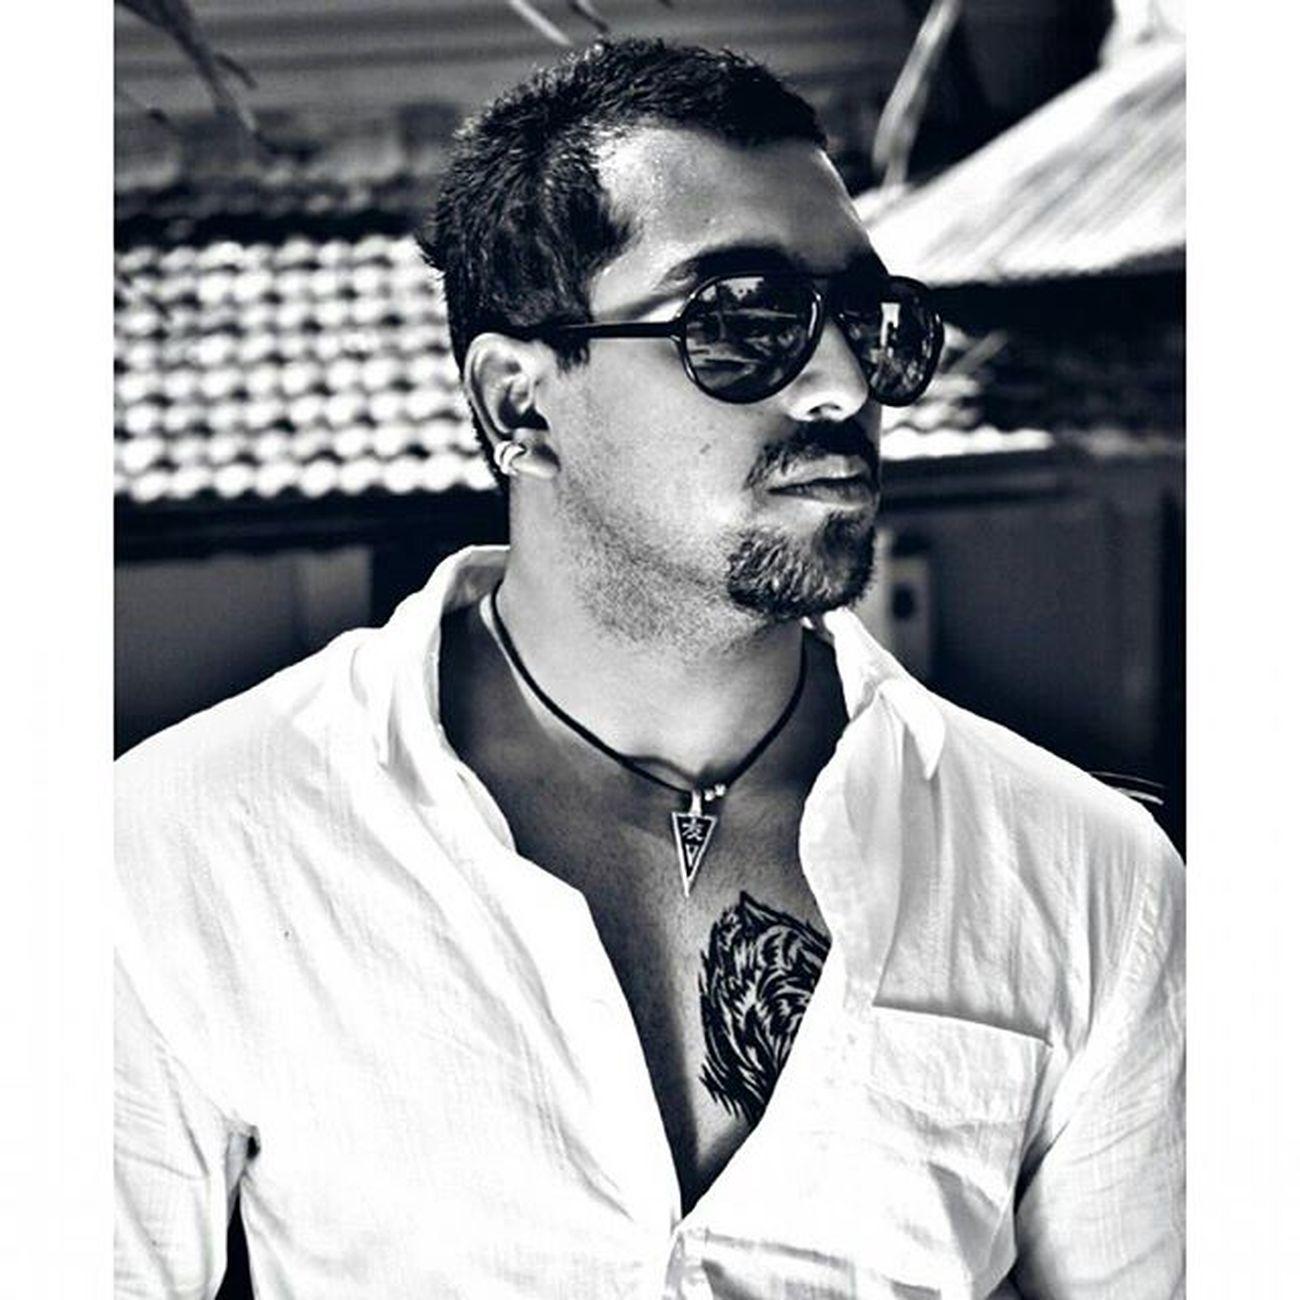 Oldpicture Modelingdays Potrait B &w Classy Model Goan Shades Earings Tattooed Instafashion Photooftheday Cool Stud Man Mensfashion ChannelV Indiafest Ahd Goa Myfashiondairies